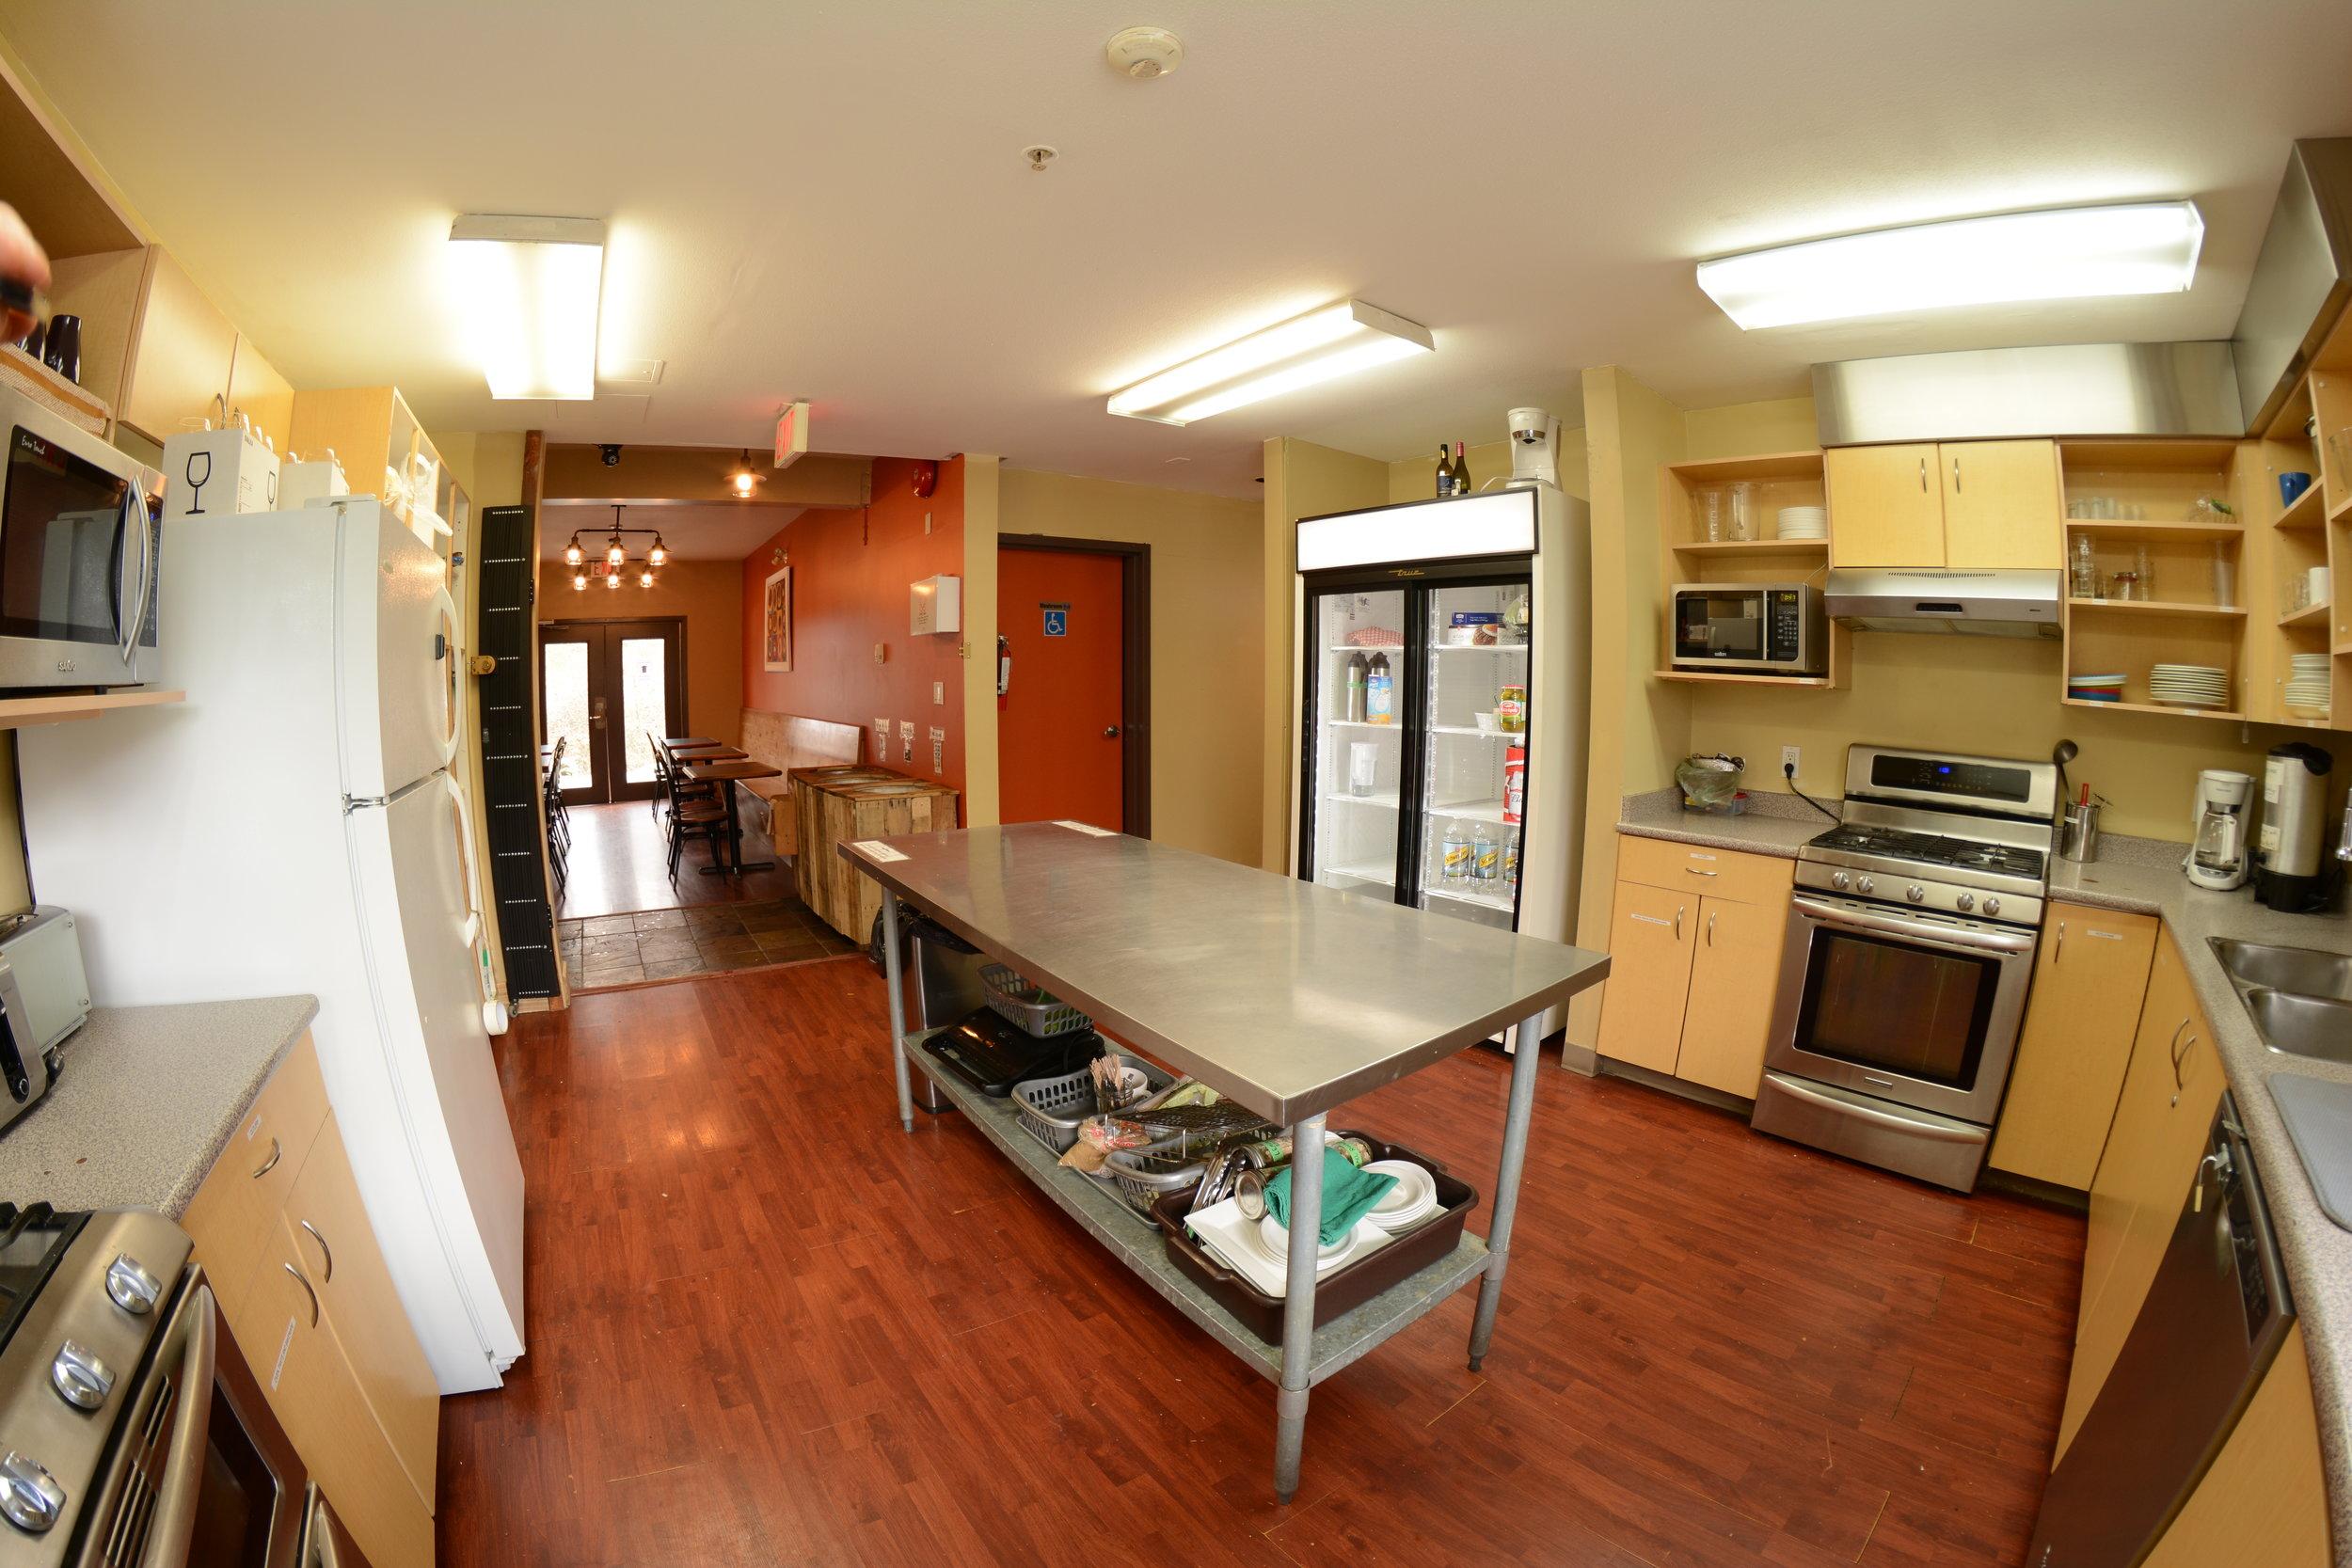 kitchen facing southeast.JPG